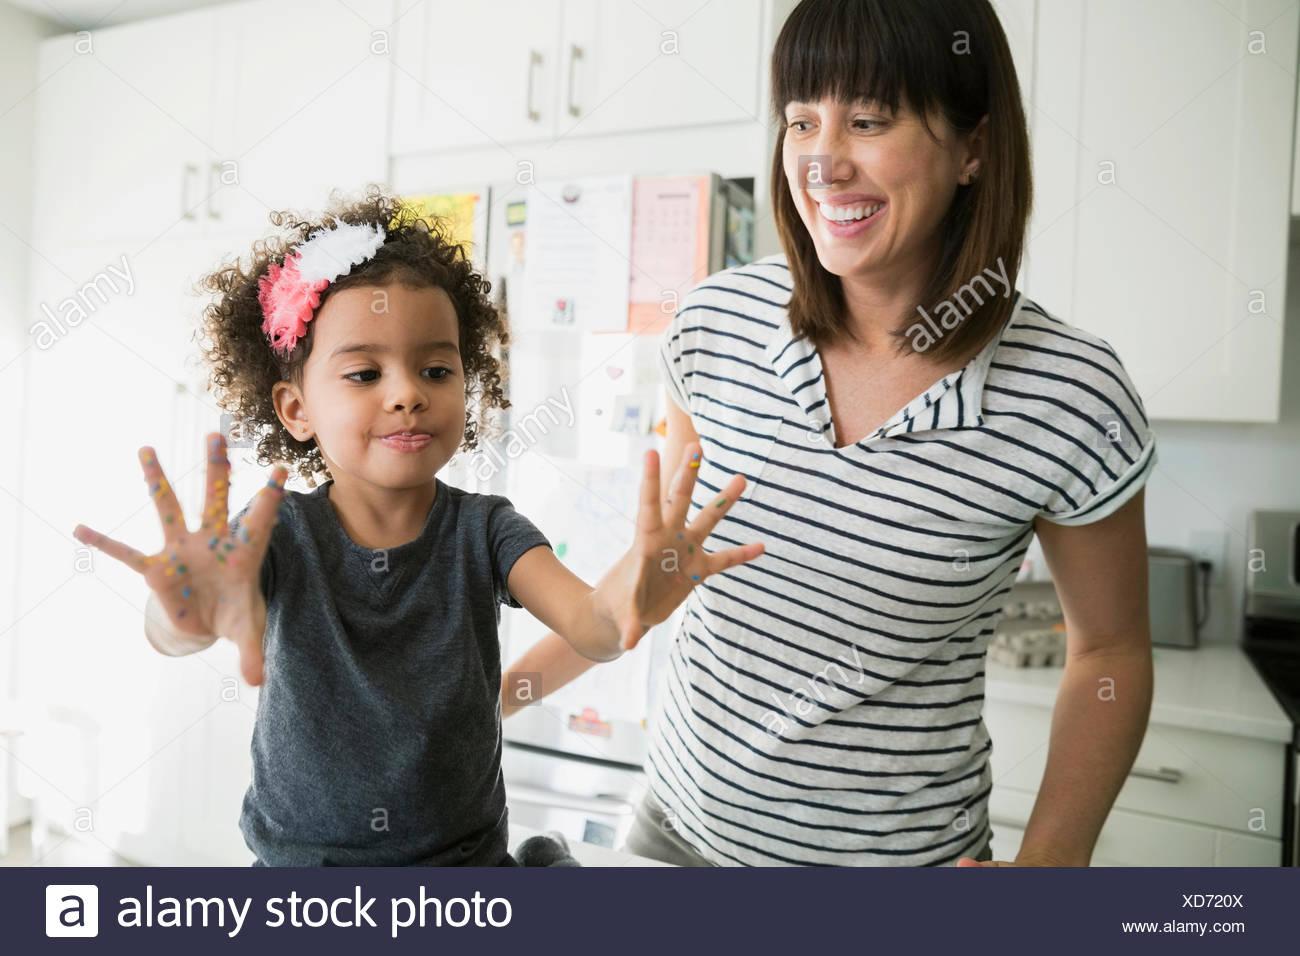 Mutter Tochter zeigen chaotisch Backen Hände ansehen Stockbild